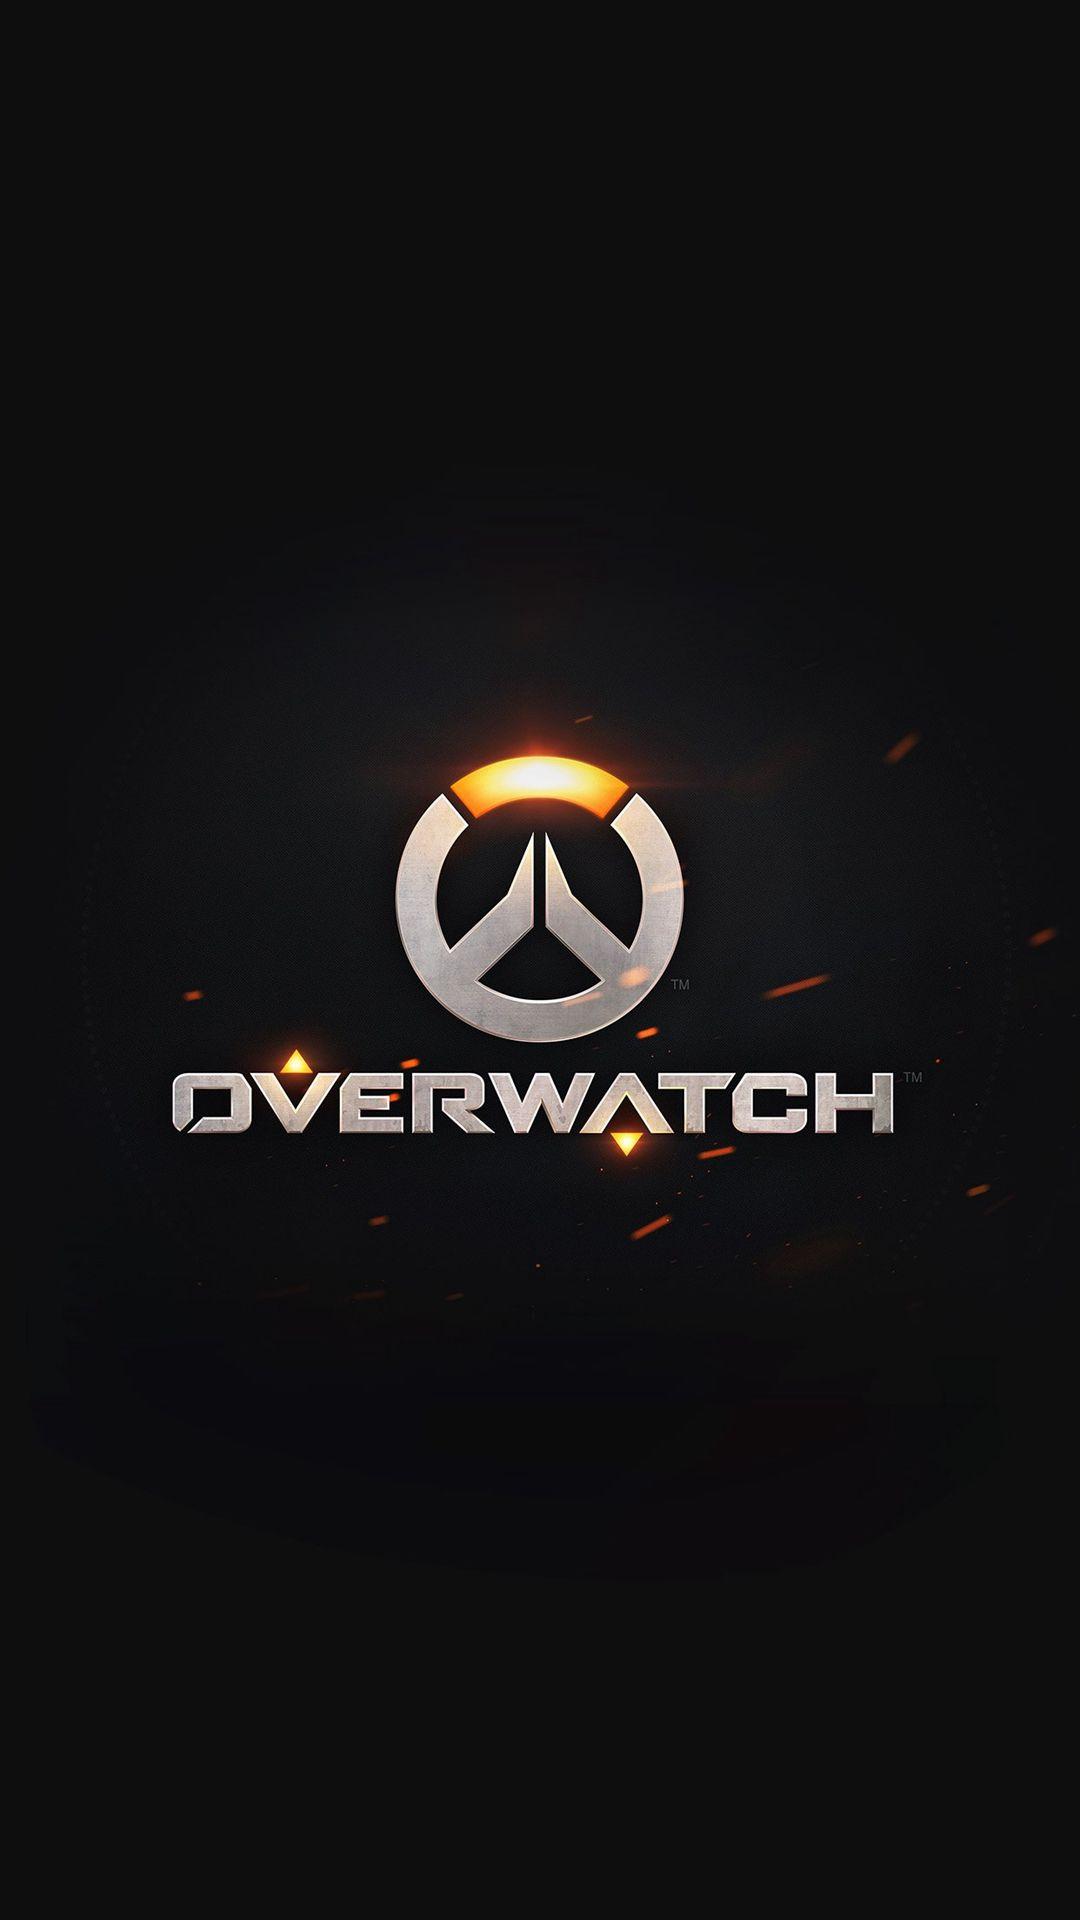 Overwatch Logo Simple Game Art Illustration Dark iPhone